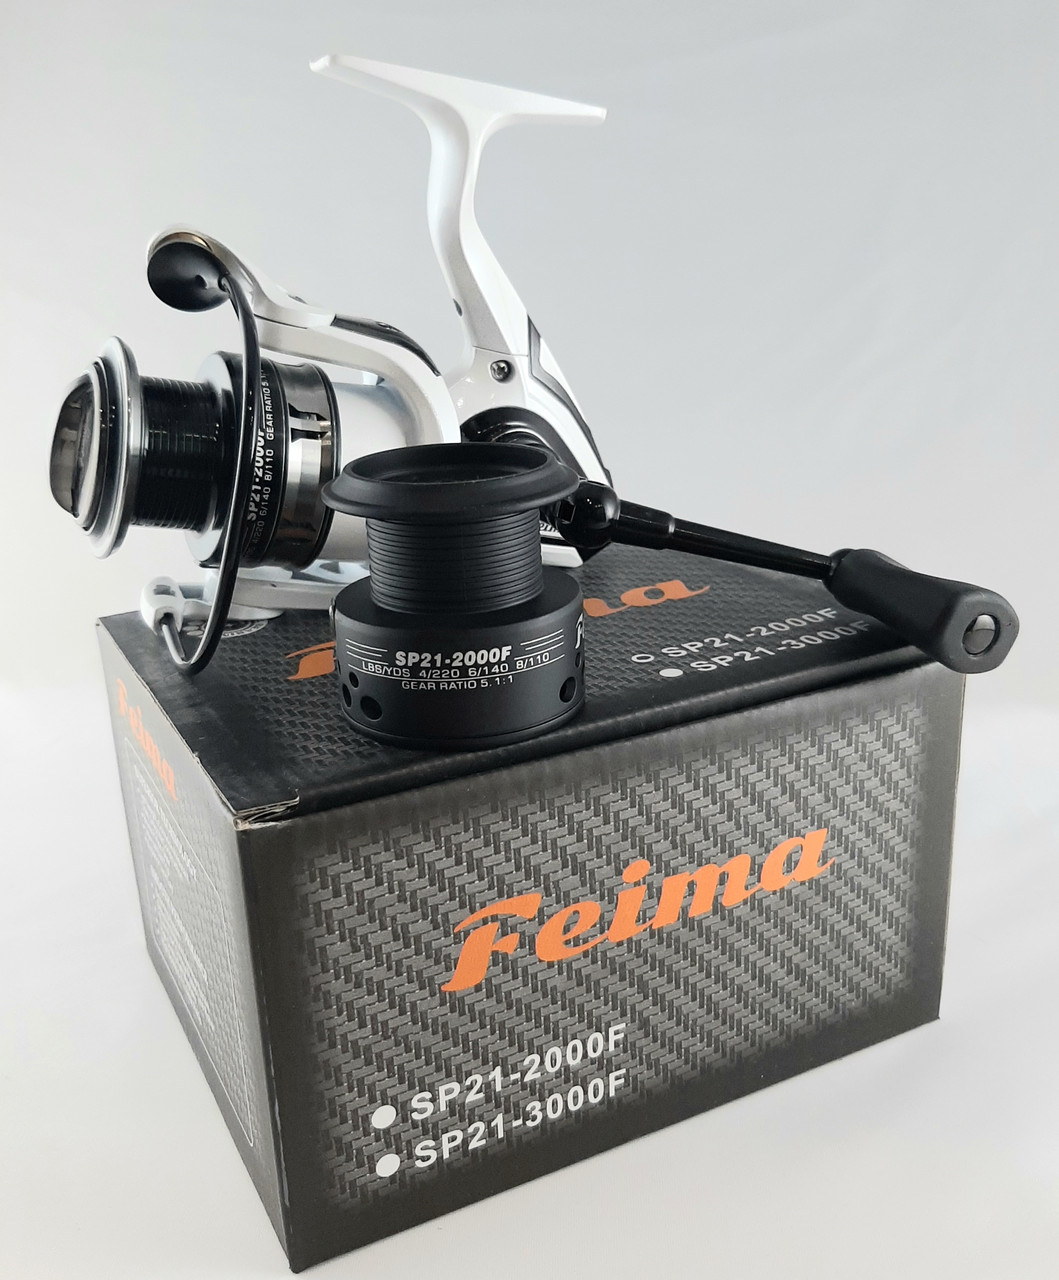 Спиннинговая катушка  Feima SP21 2000F